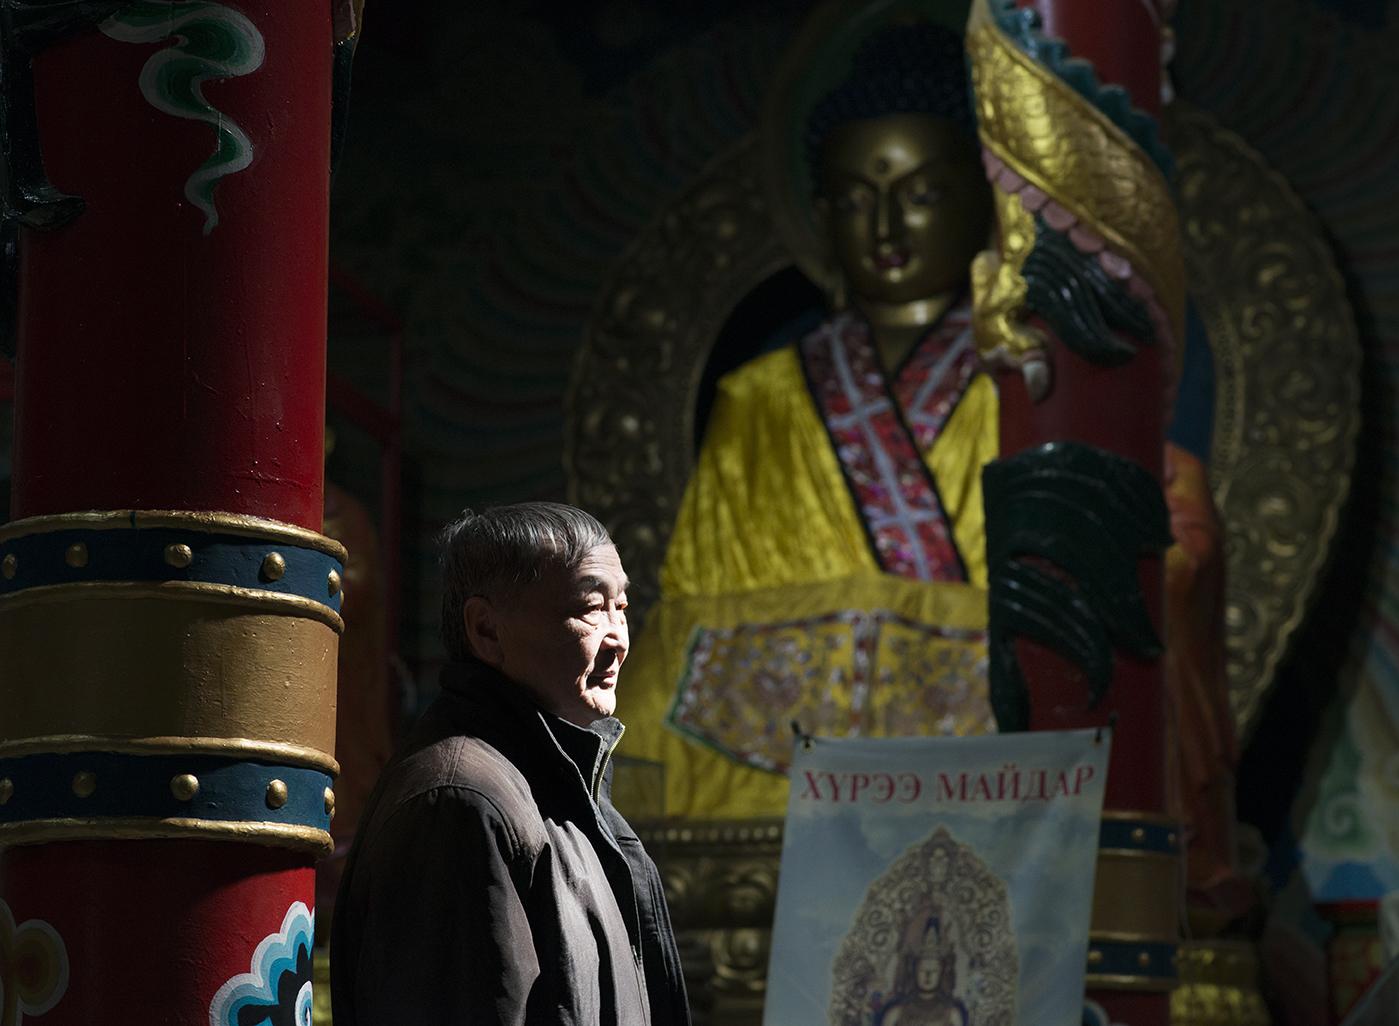 Shaariibuu Setev at a Buddhist temple in Ulaanbaatar where he weekly visits to pray for Altantuya's spirit.